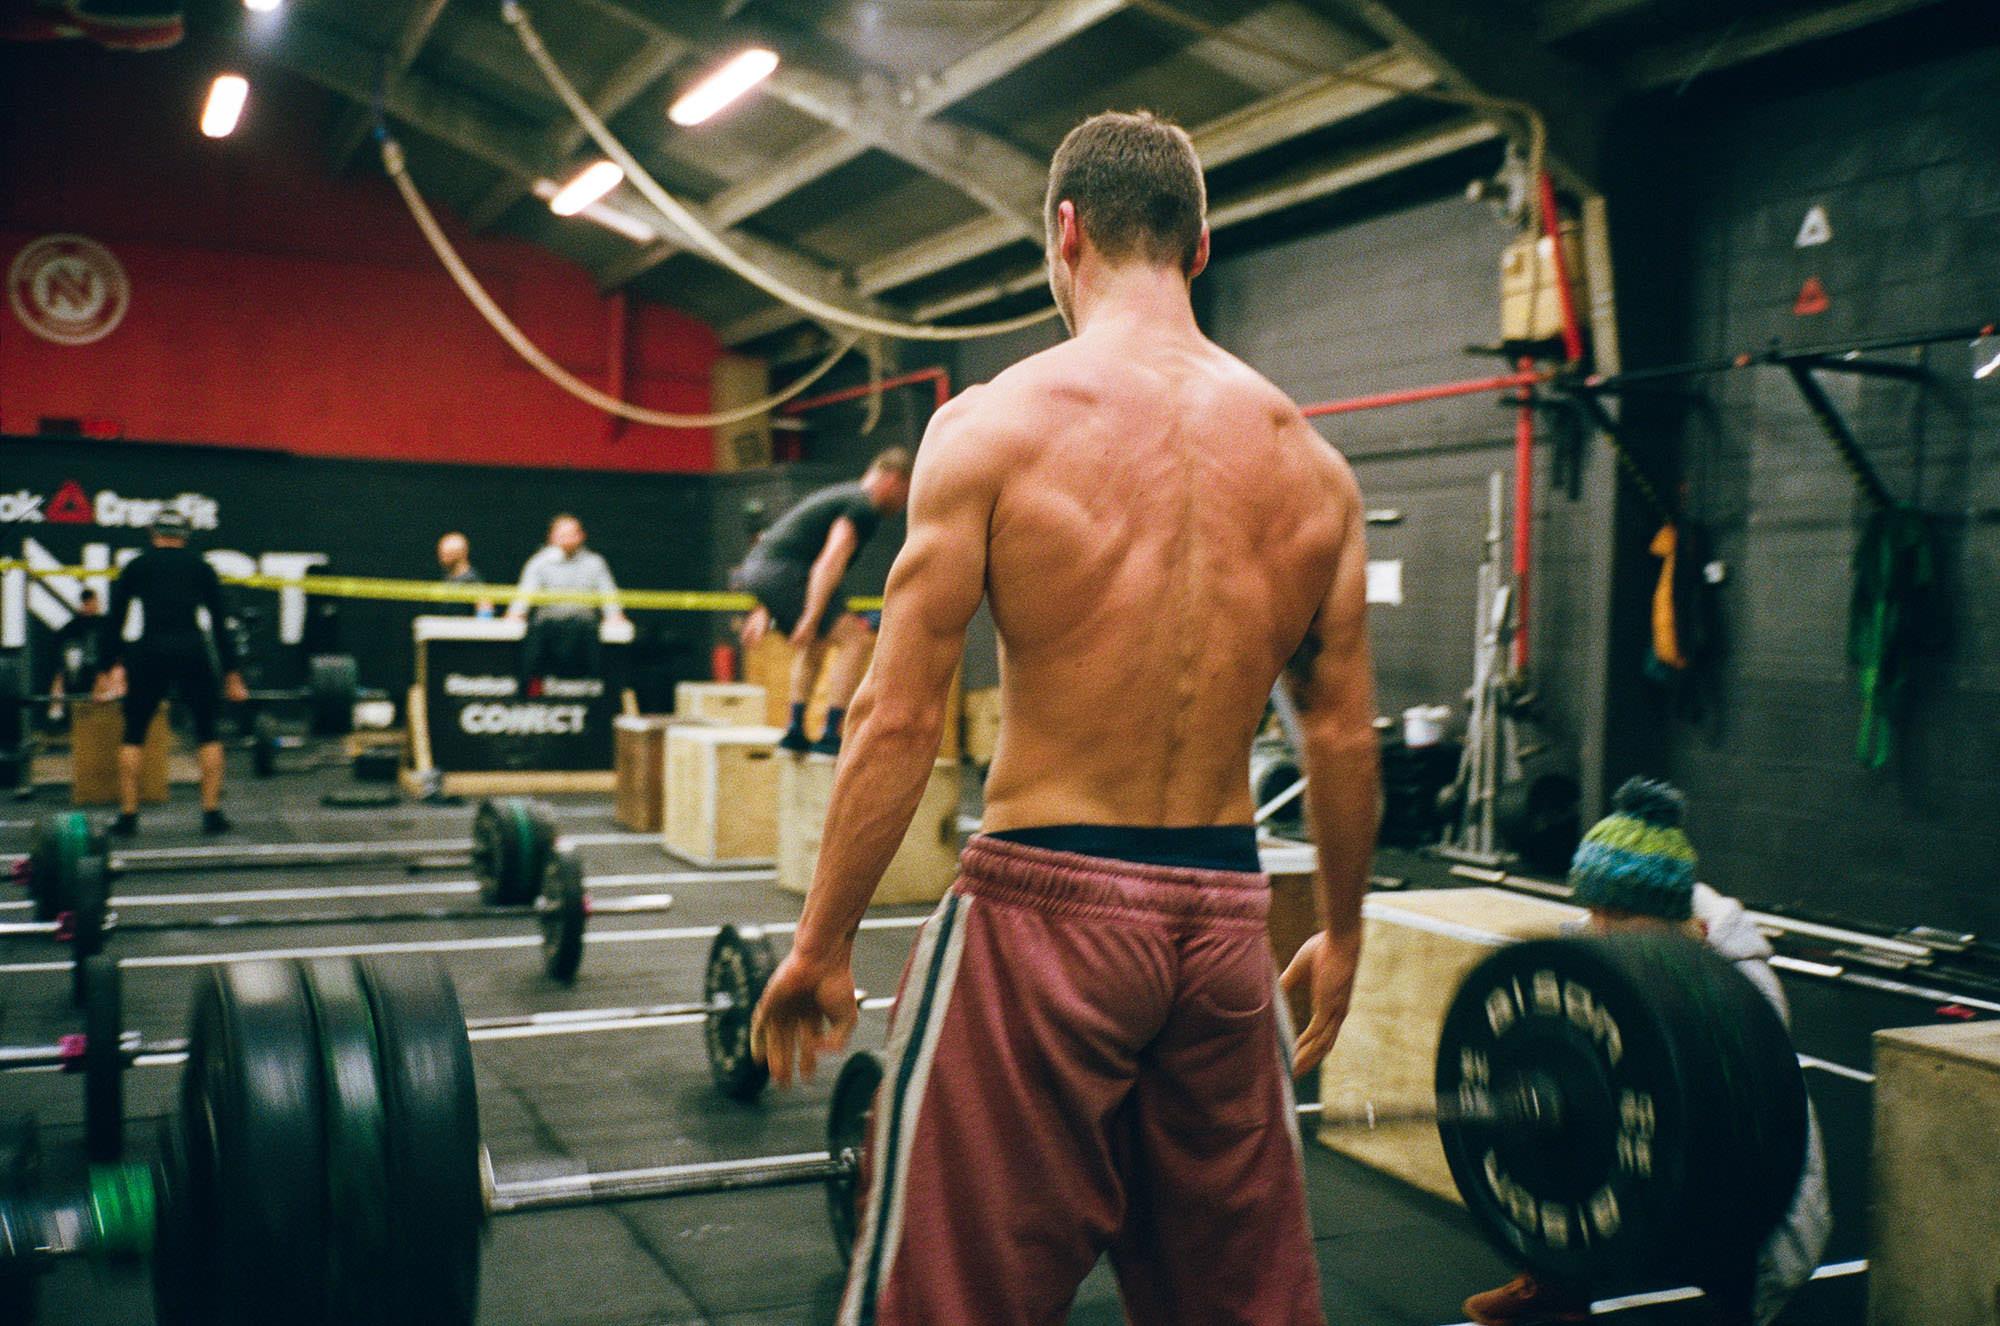 crossfit, athlete, weightliofting, film photography